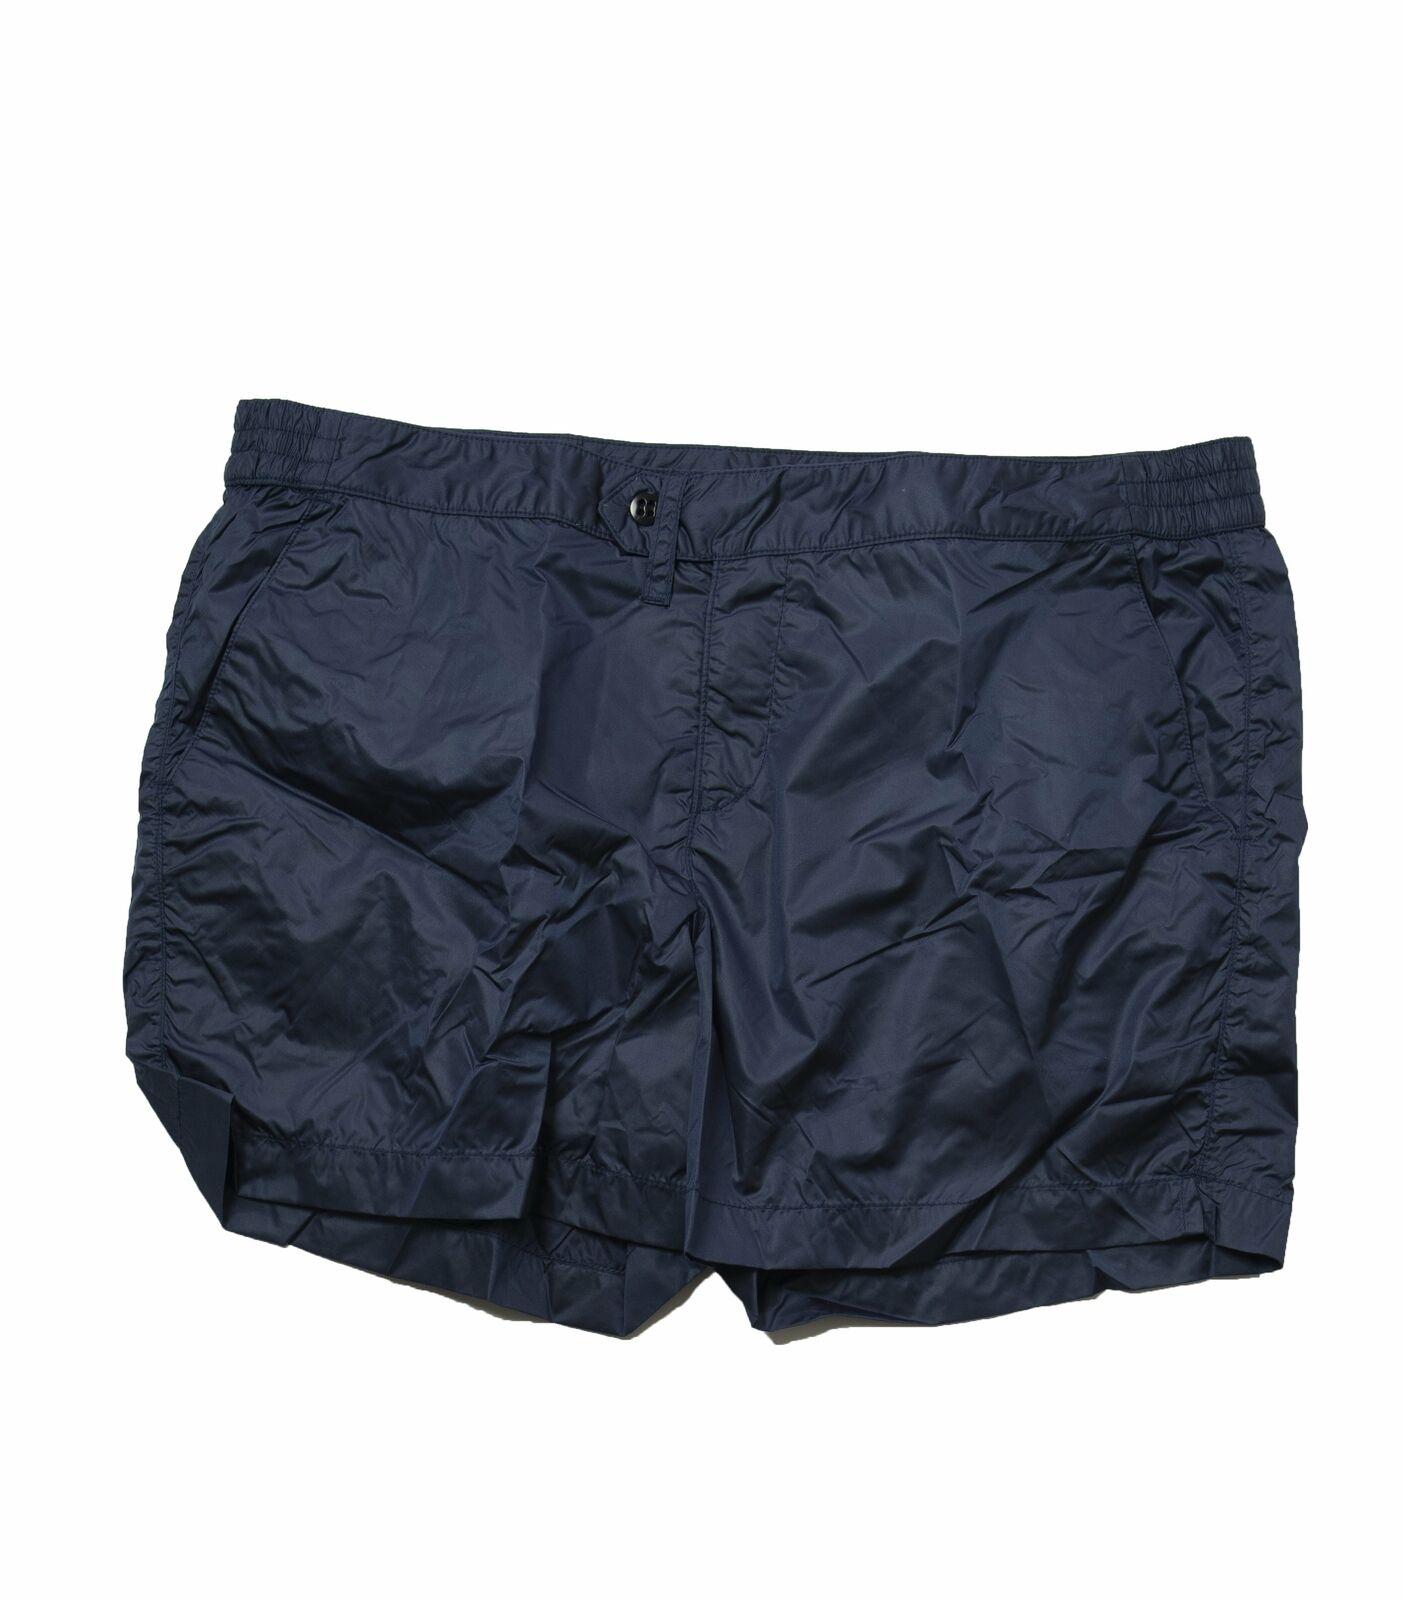 BOGLIOLI Solid bluee Swim Shorts  Made in